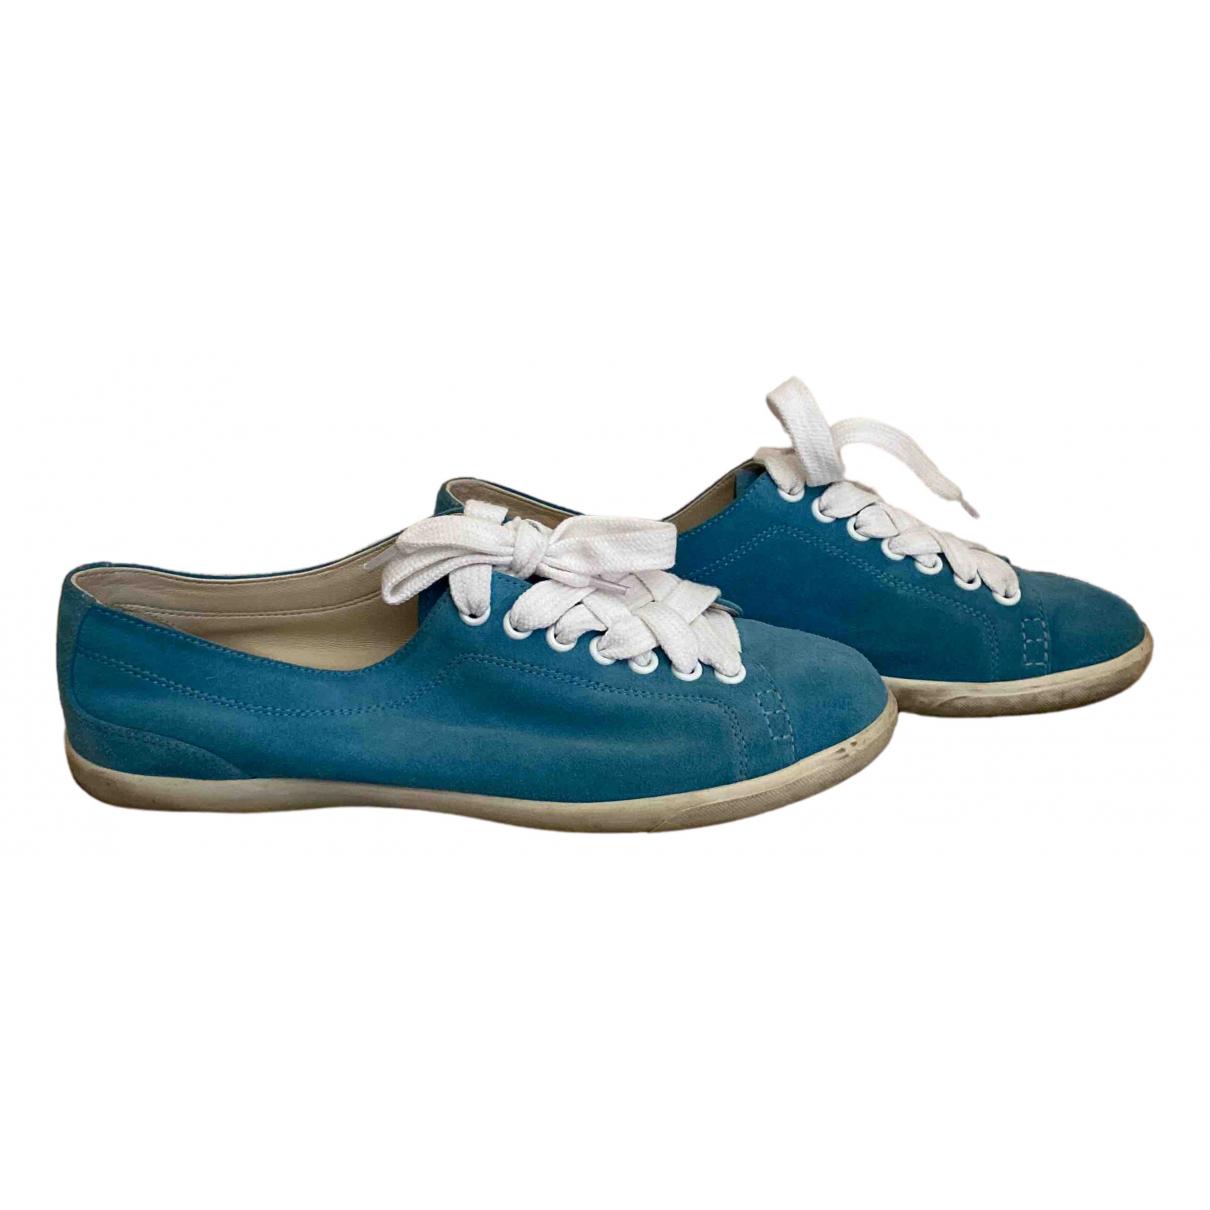 Bottega Veneta \N Turquoise Suede Trainers for Women 38 IT